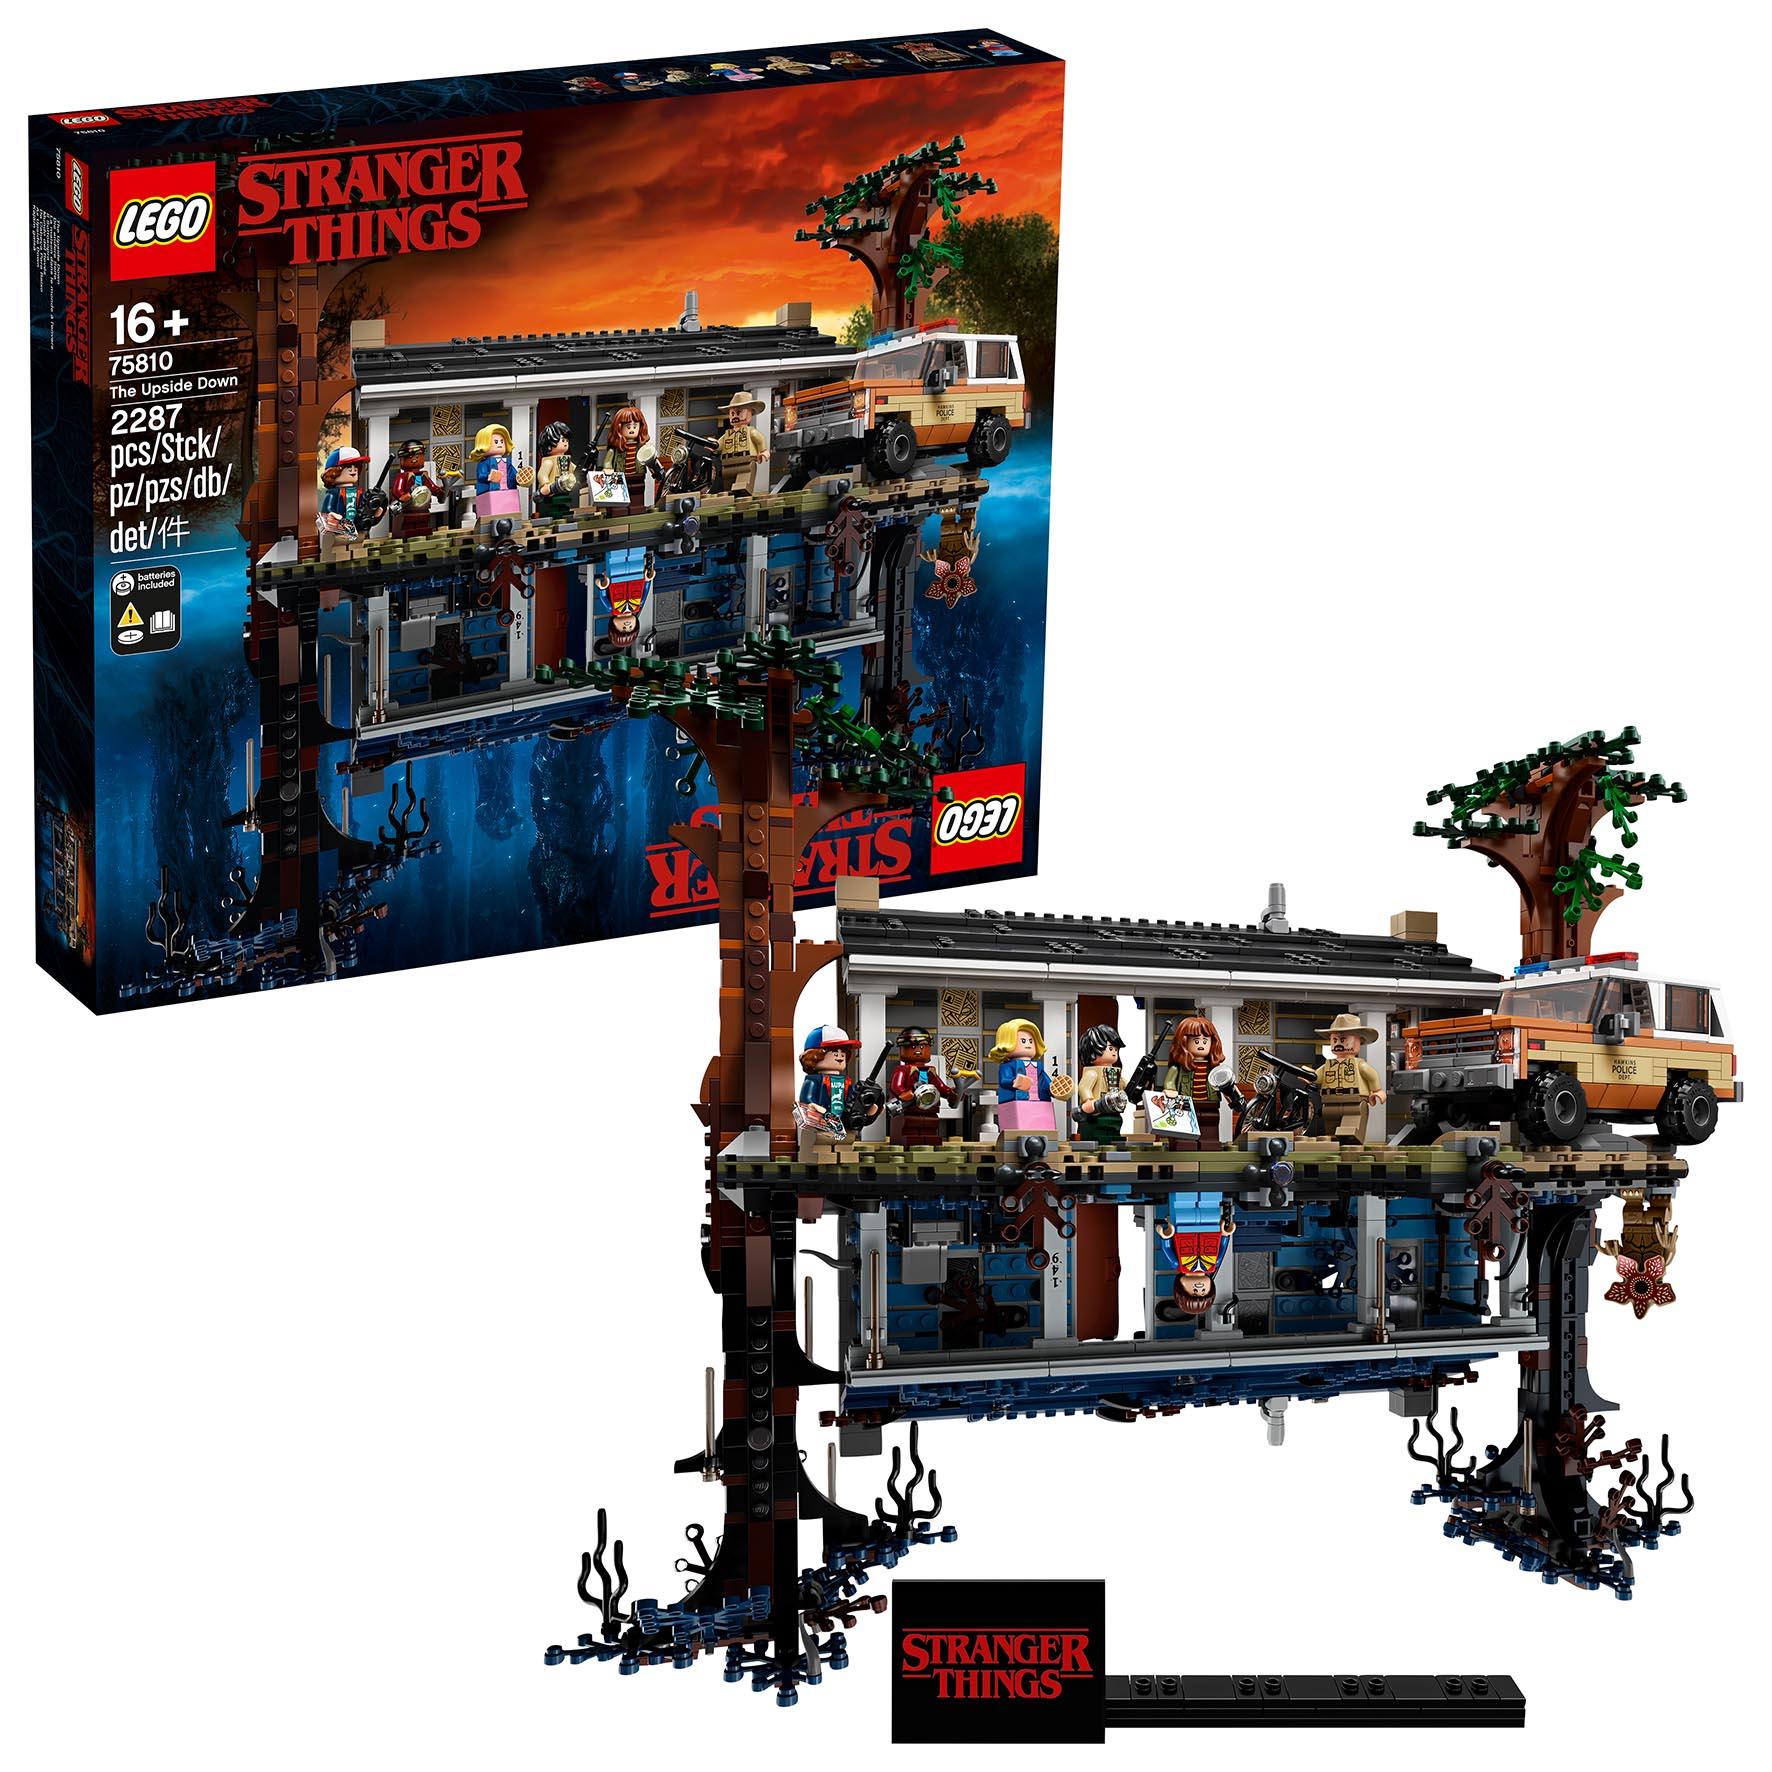 CASA DI STRANGER THINGS LEGO